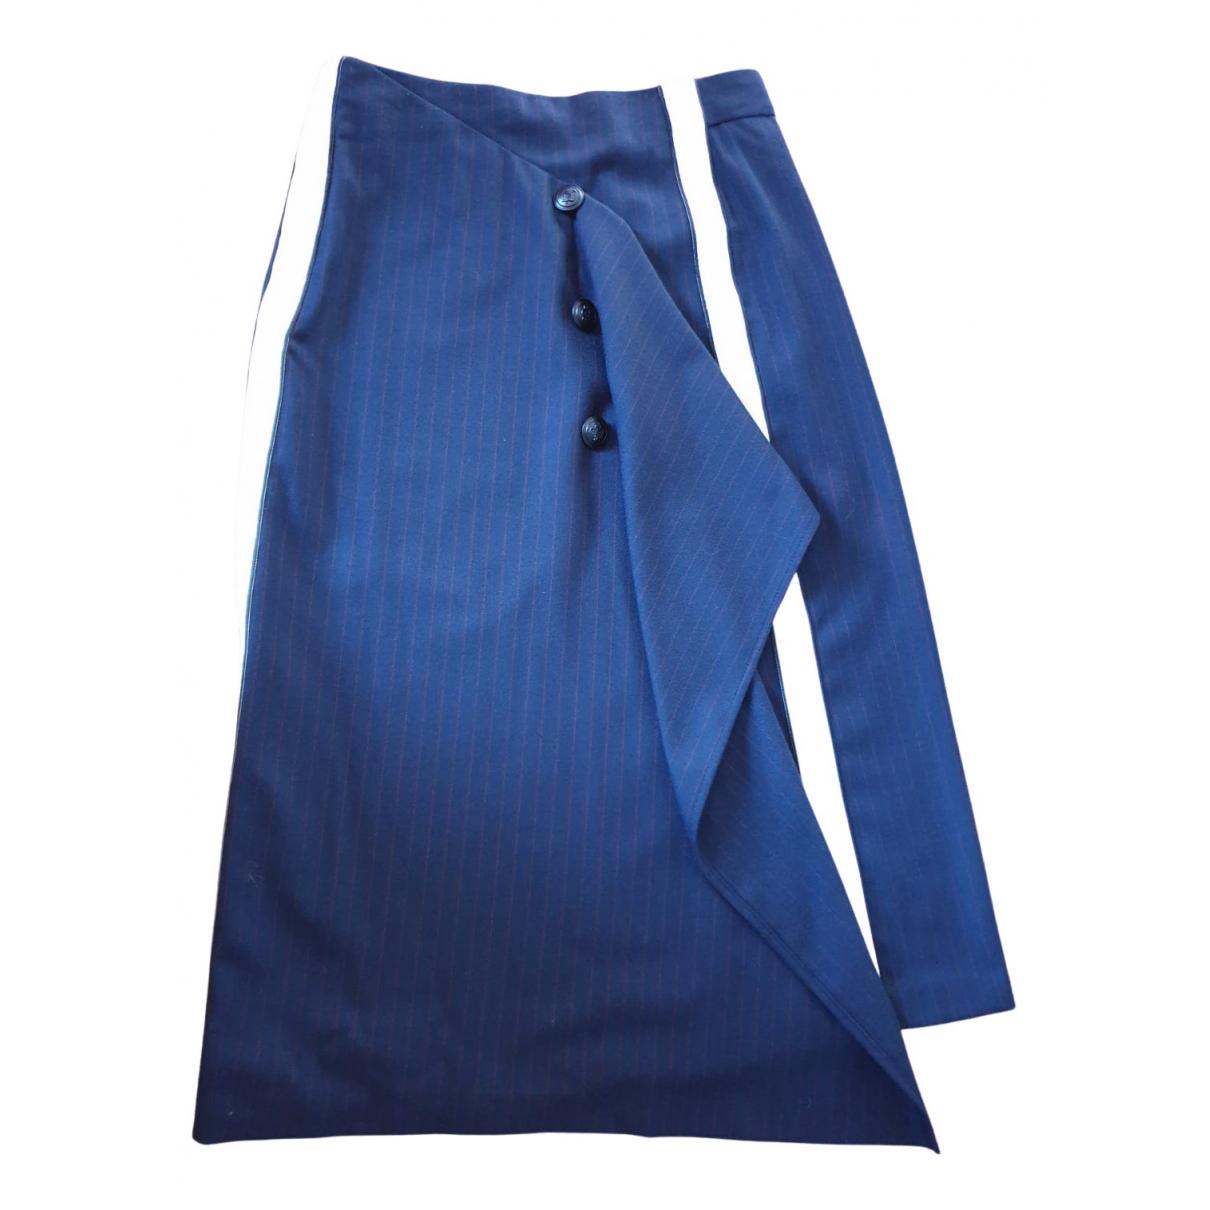 Maje Fall Winter 2019 Navy Cotton skirt for Women 36 FR